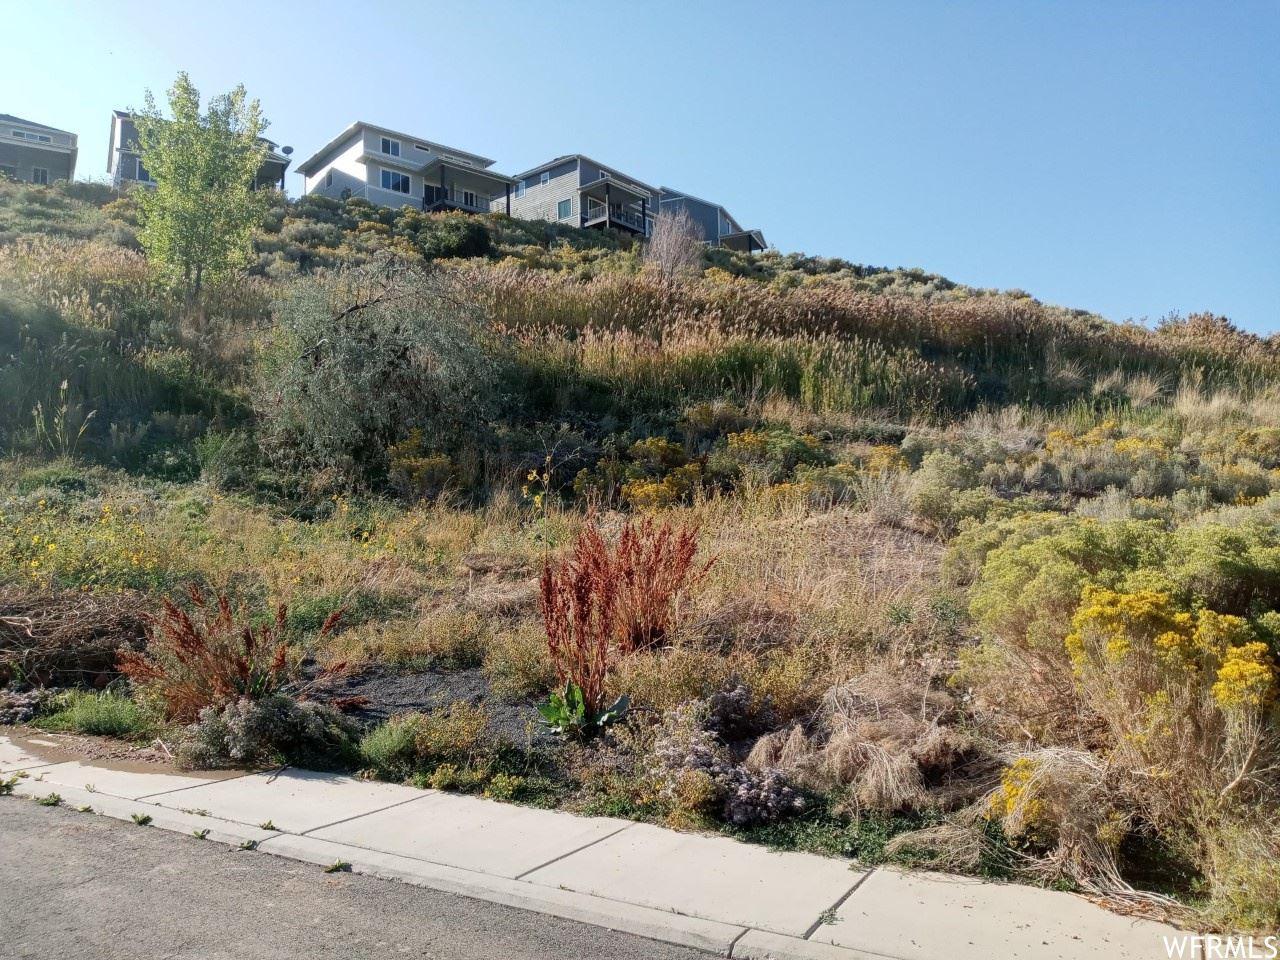 Photo of 132 E SUNSET VISTA CT, North Salt Lake, UT 84054 (MLS # 1771121)